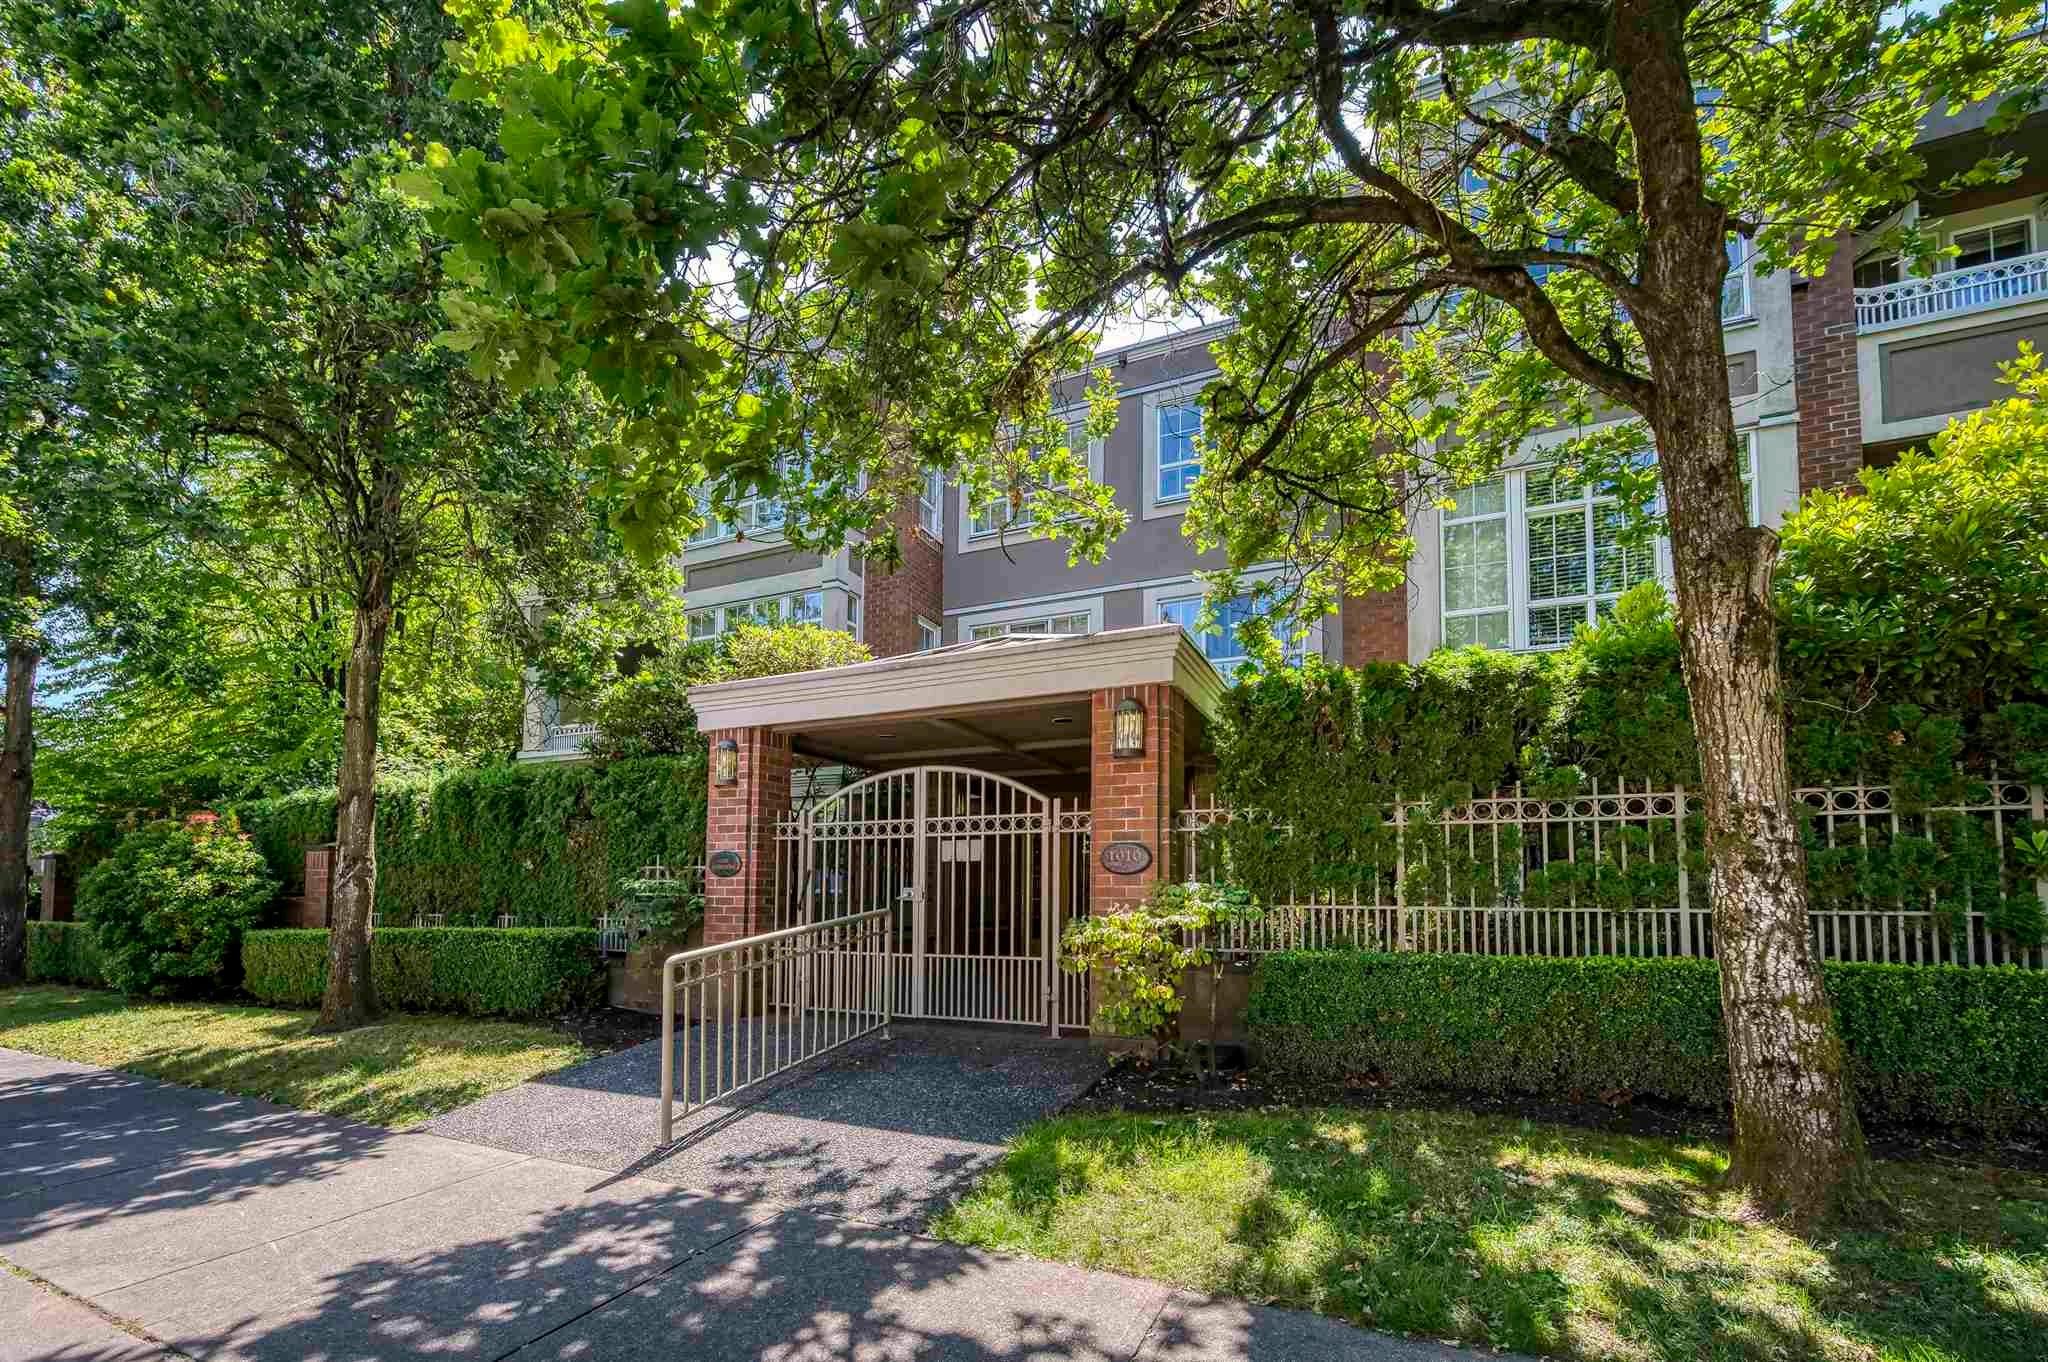 106 1010 W 42ND AVENUE - South Granville Apartment/Condo for sale, 2 Bedrooms (R2604998)